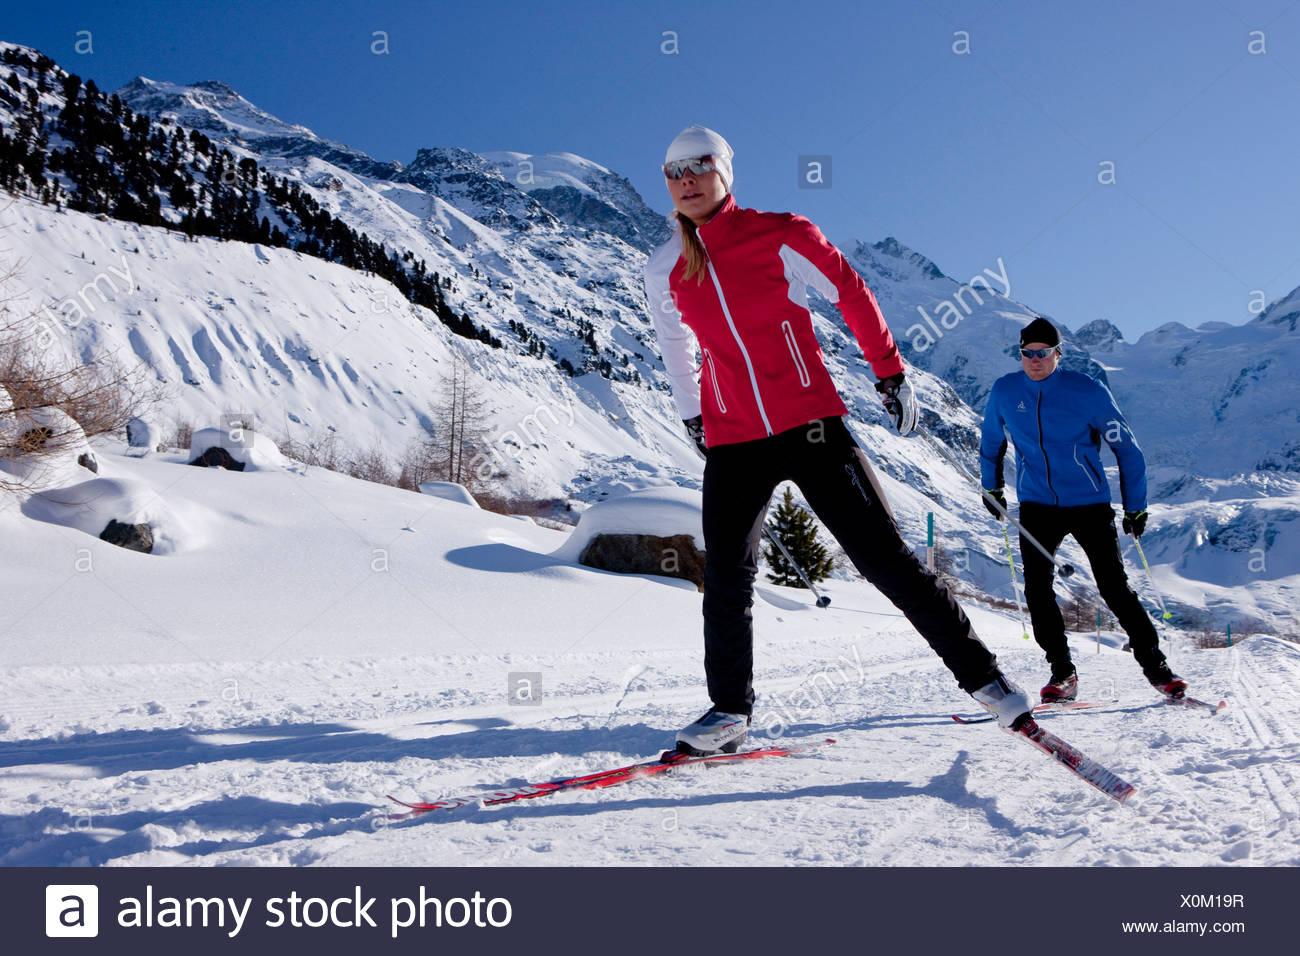 Langlauf, Ski, Bernina-Massiv, Bernina, Winter, Kanton, GR, Graubünden, Graubünden, Engadin, Engadin, Oberengadin, Kreuz-Ländern Stockbild